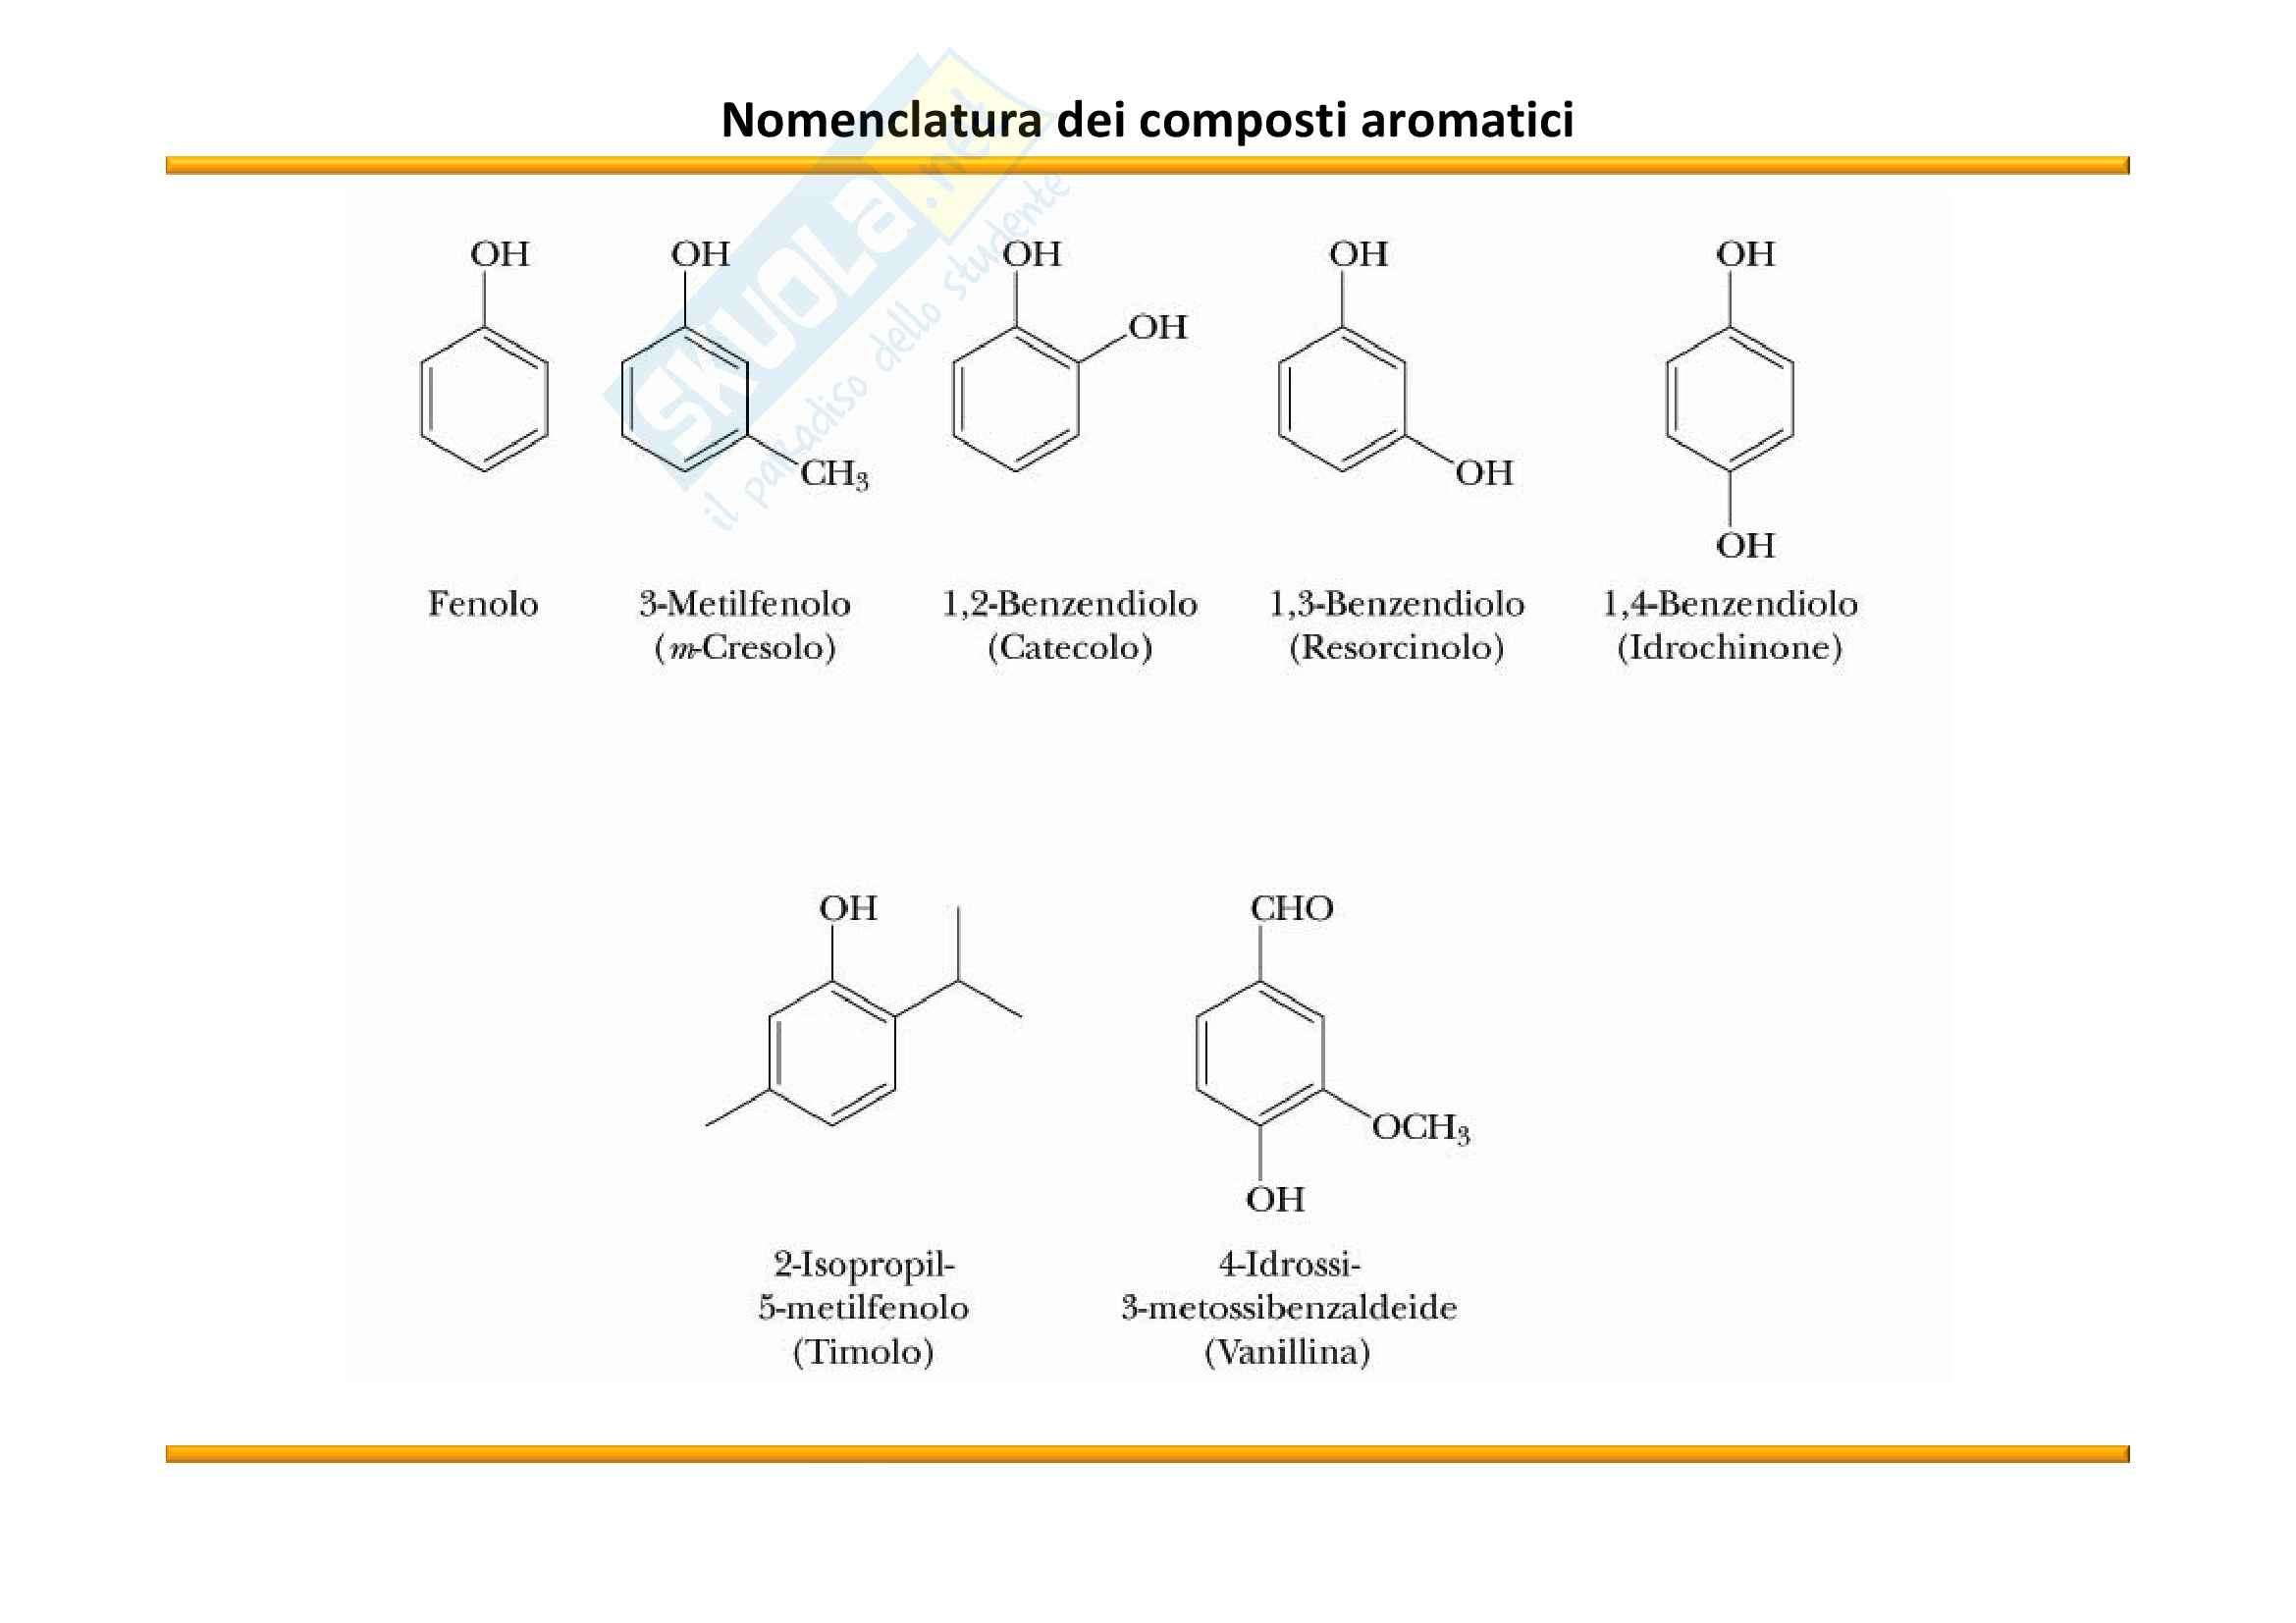 Chimica Organica: Composti aromatici Pag. 31